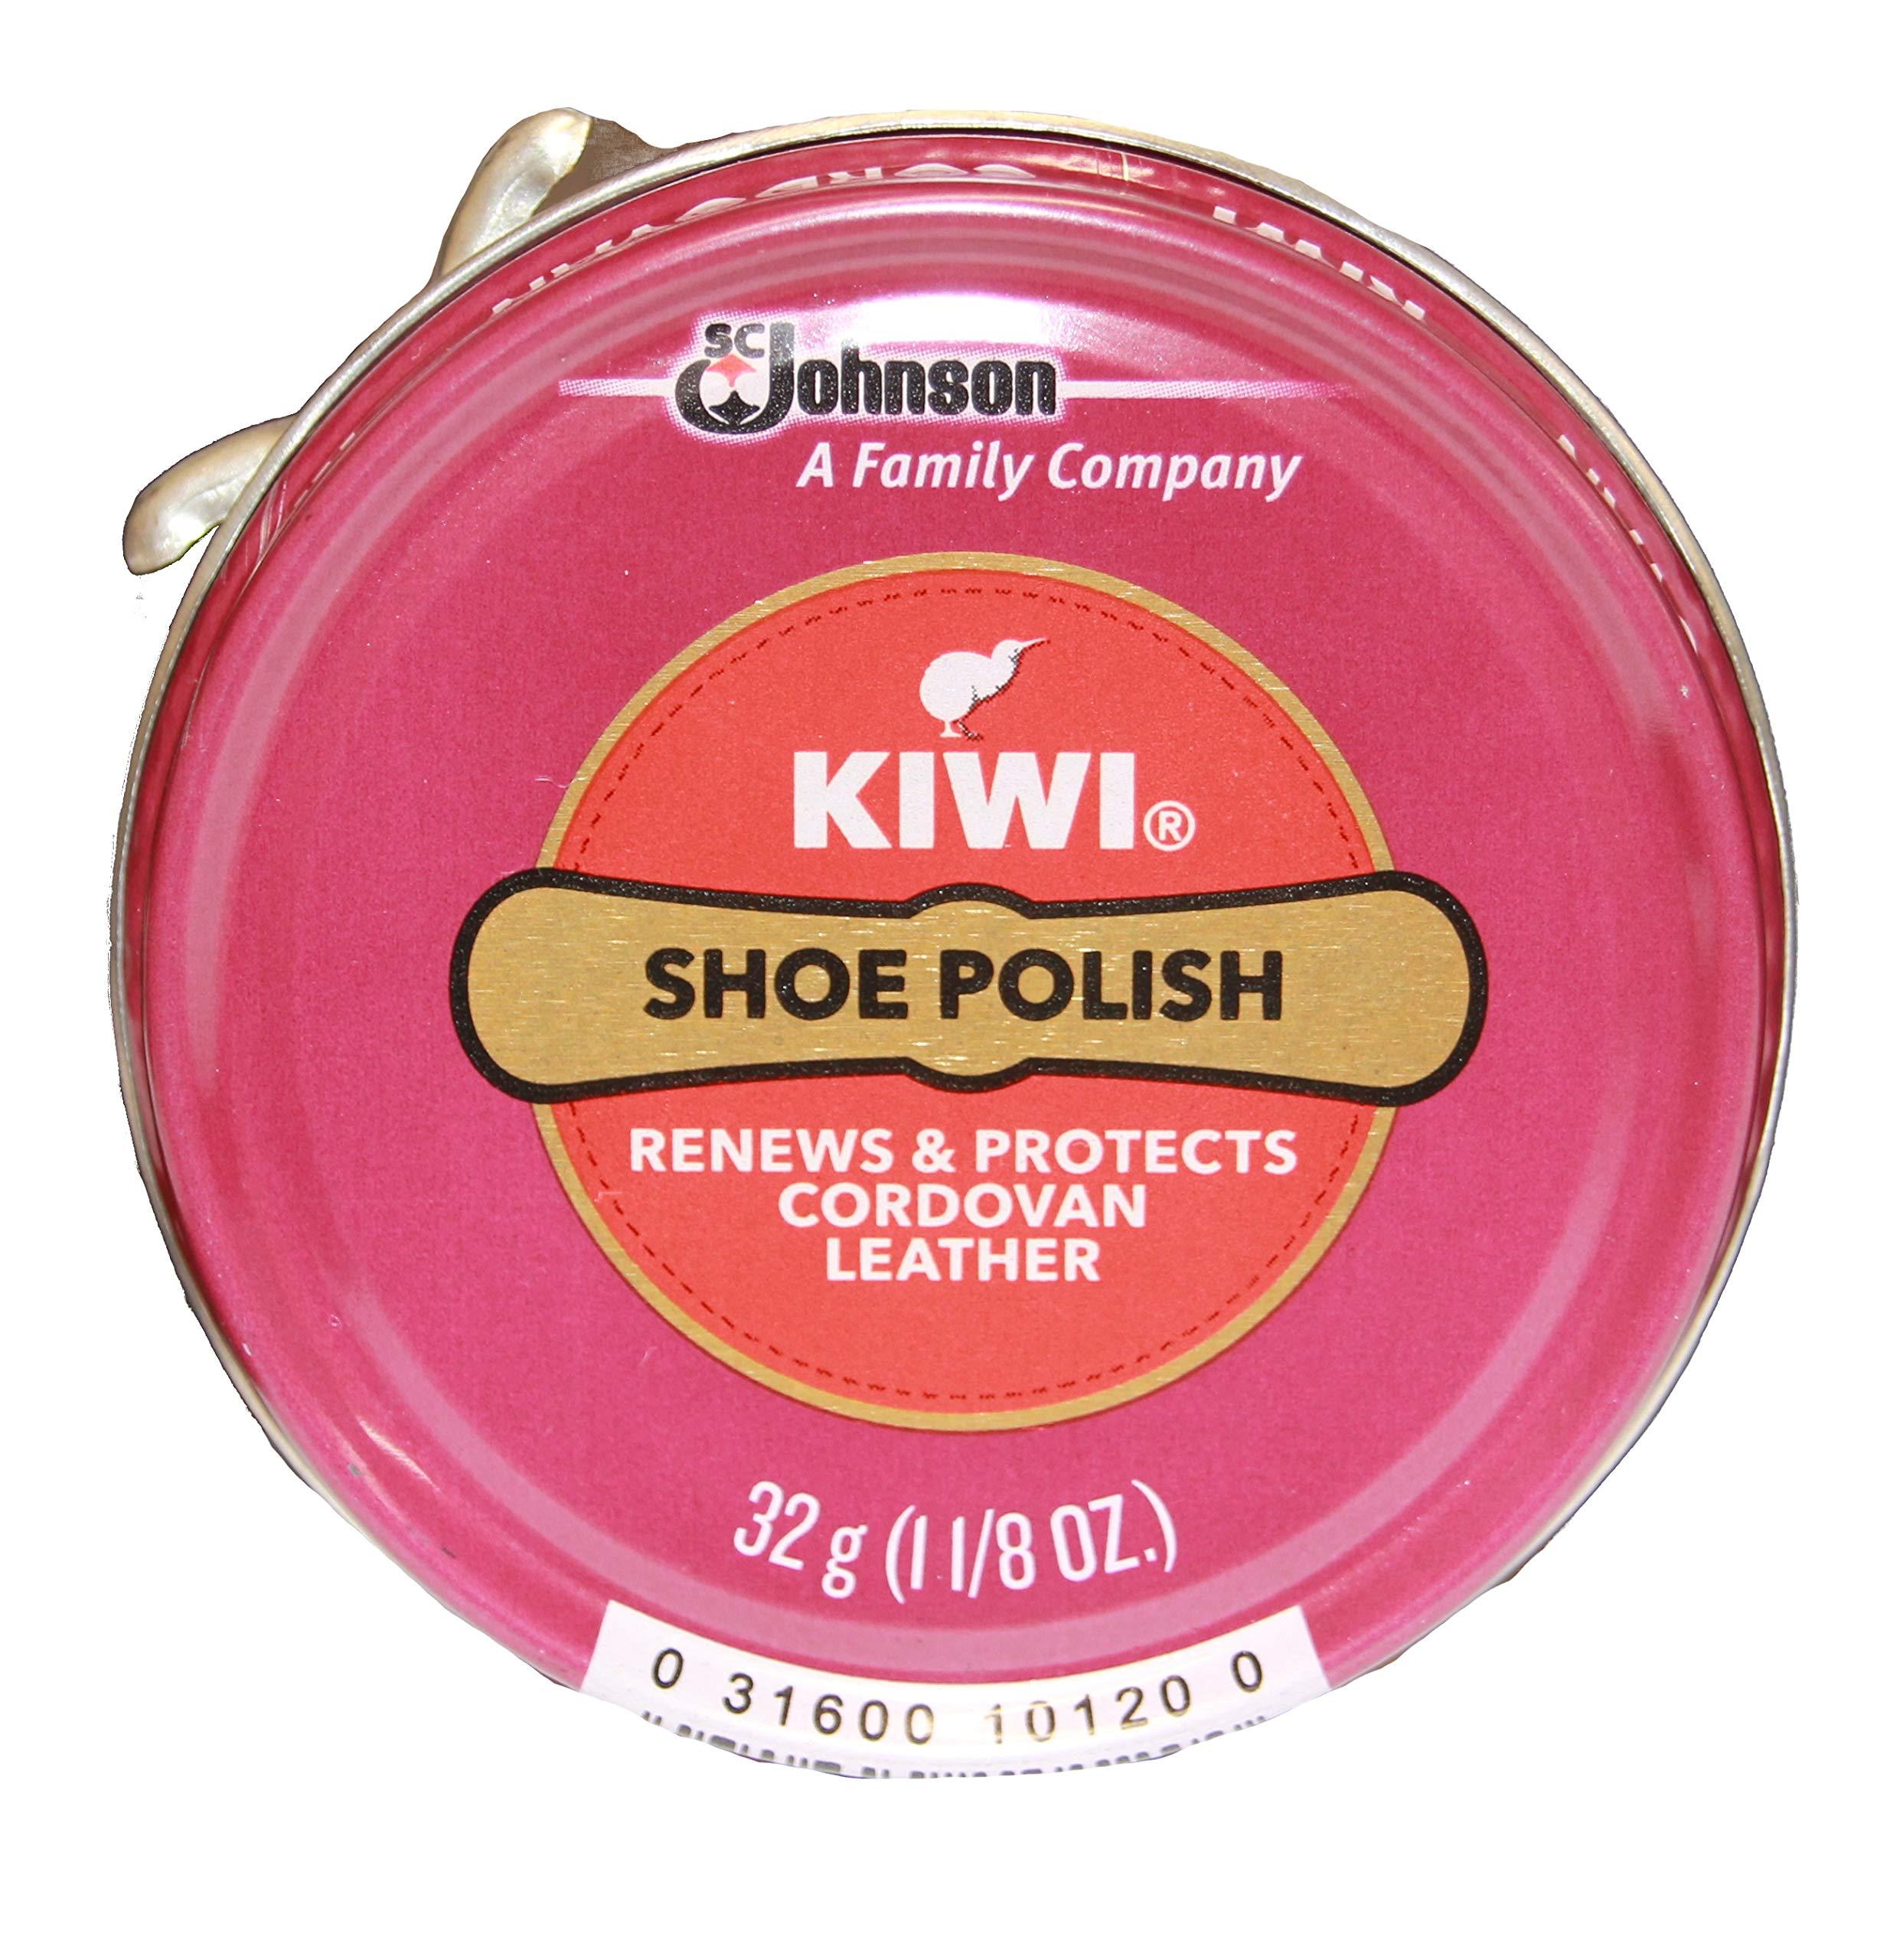 Kiwi Cordovan Shoe Polish, 1-1/8 oz